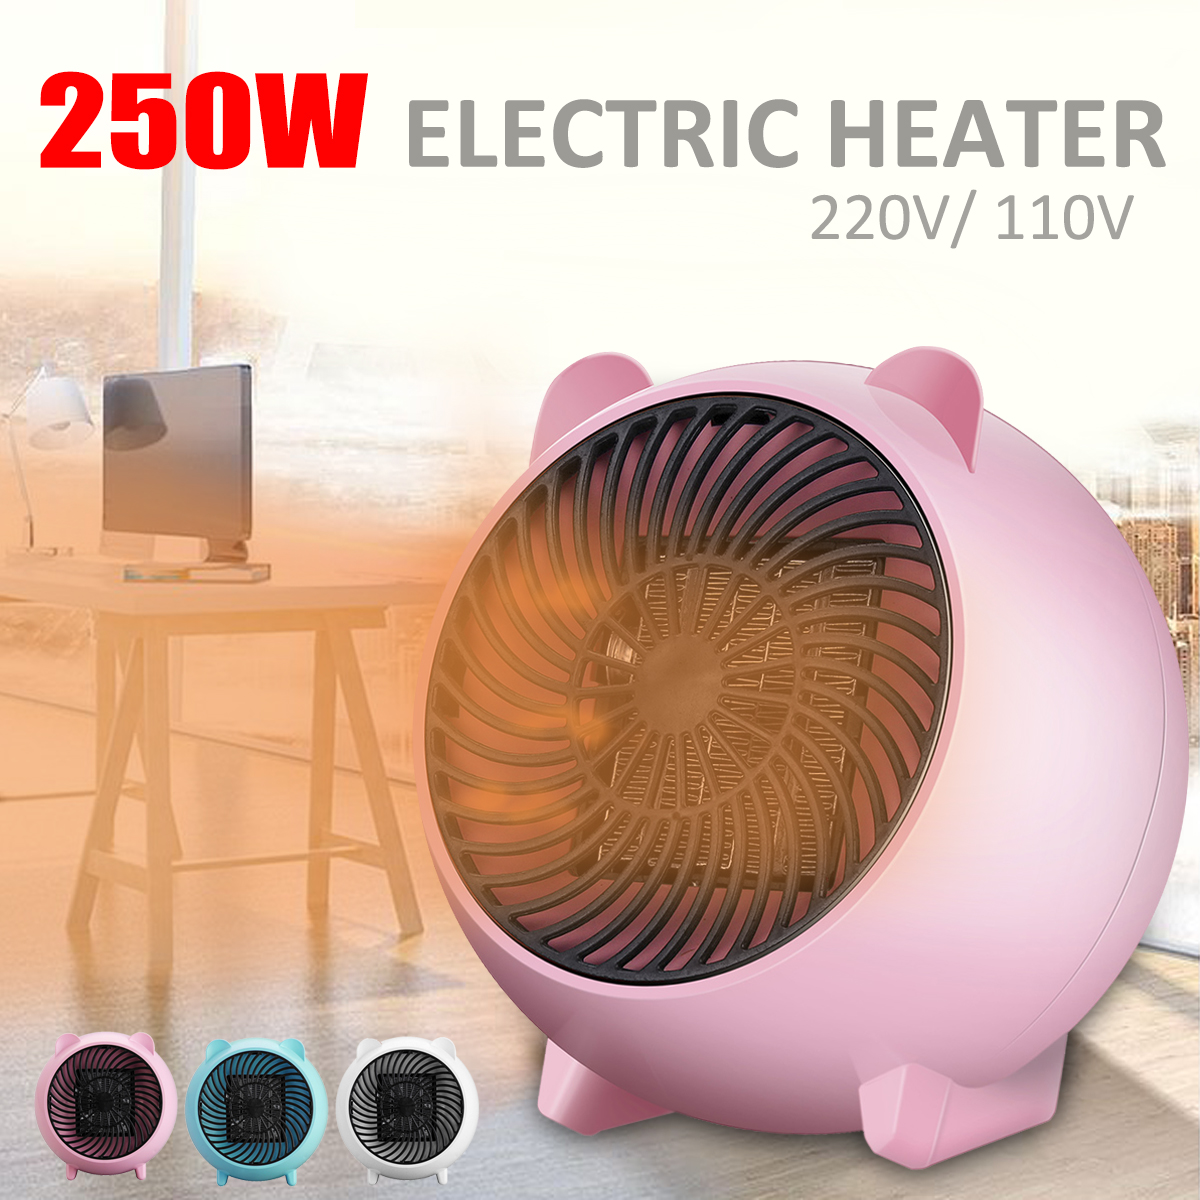 10㎡ 250W Mini Electric Air Heater Fan Portable Automatic Space Heating Fan  Blower Home Office Desktop Furnace Warmer Winter Bask Artifact Indoor Best Gift